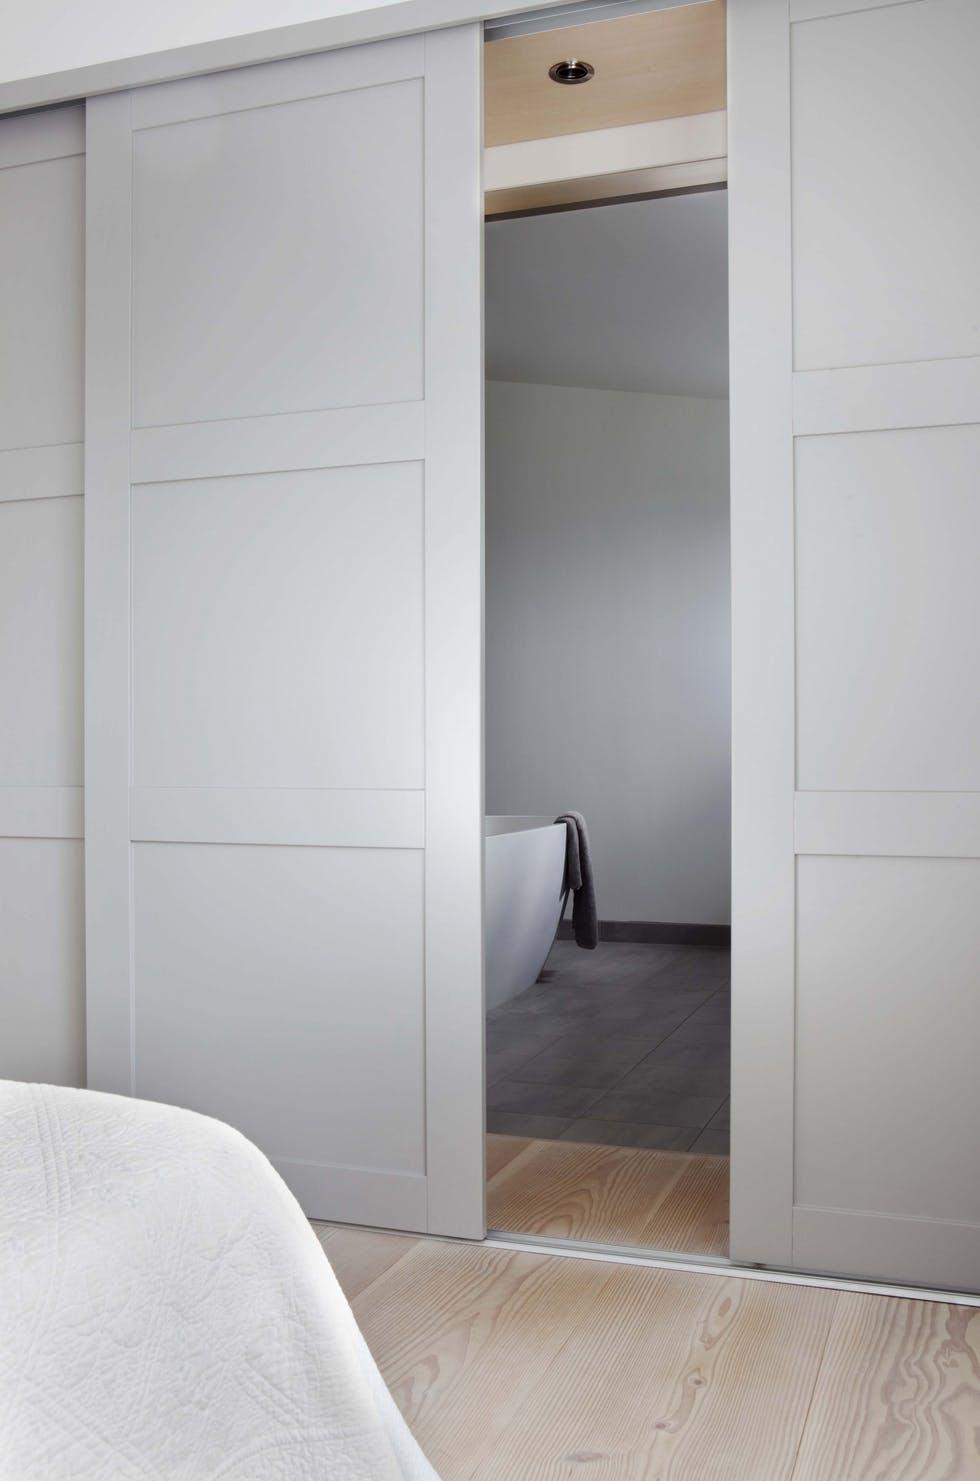 Bo Bedre (Norway) - Concealed Track & Embedded Floor Guide. A nice clean look.